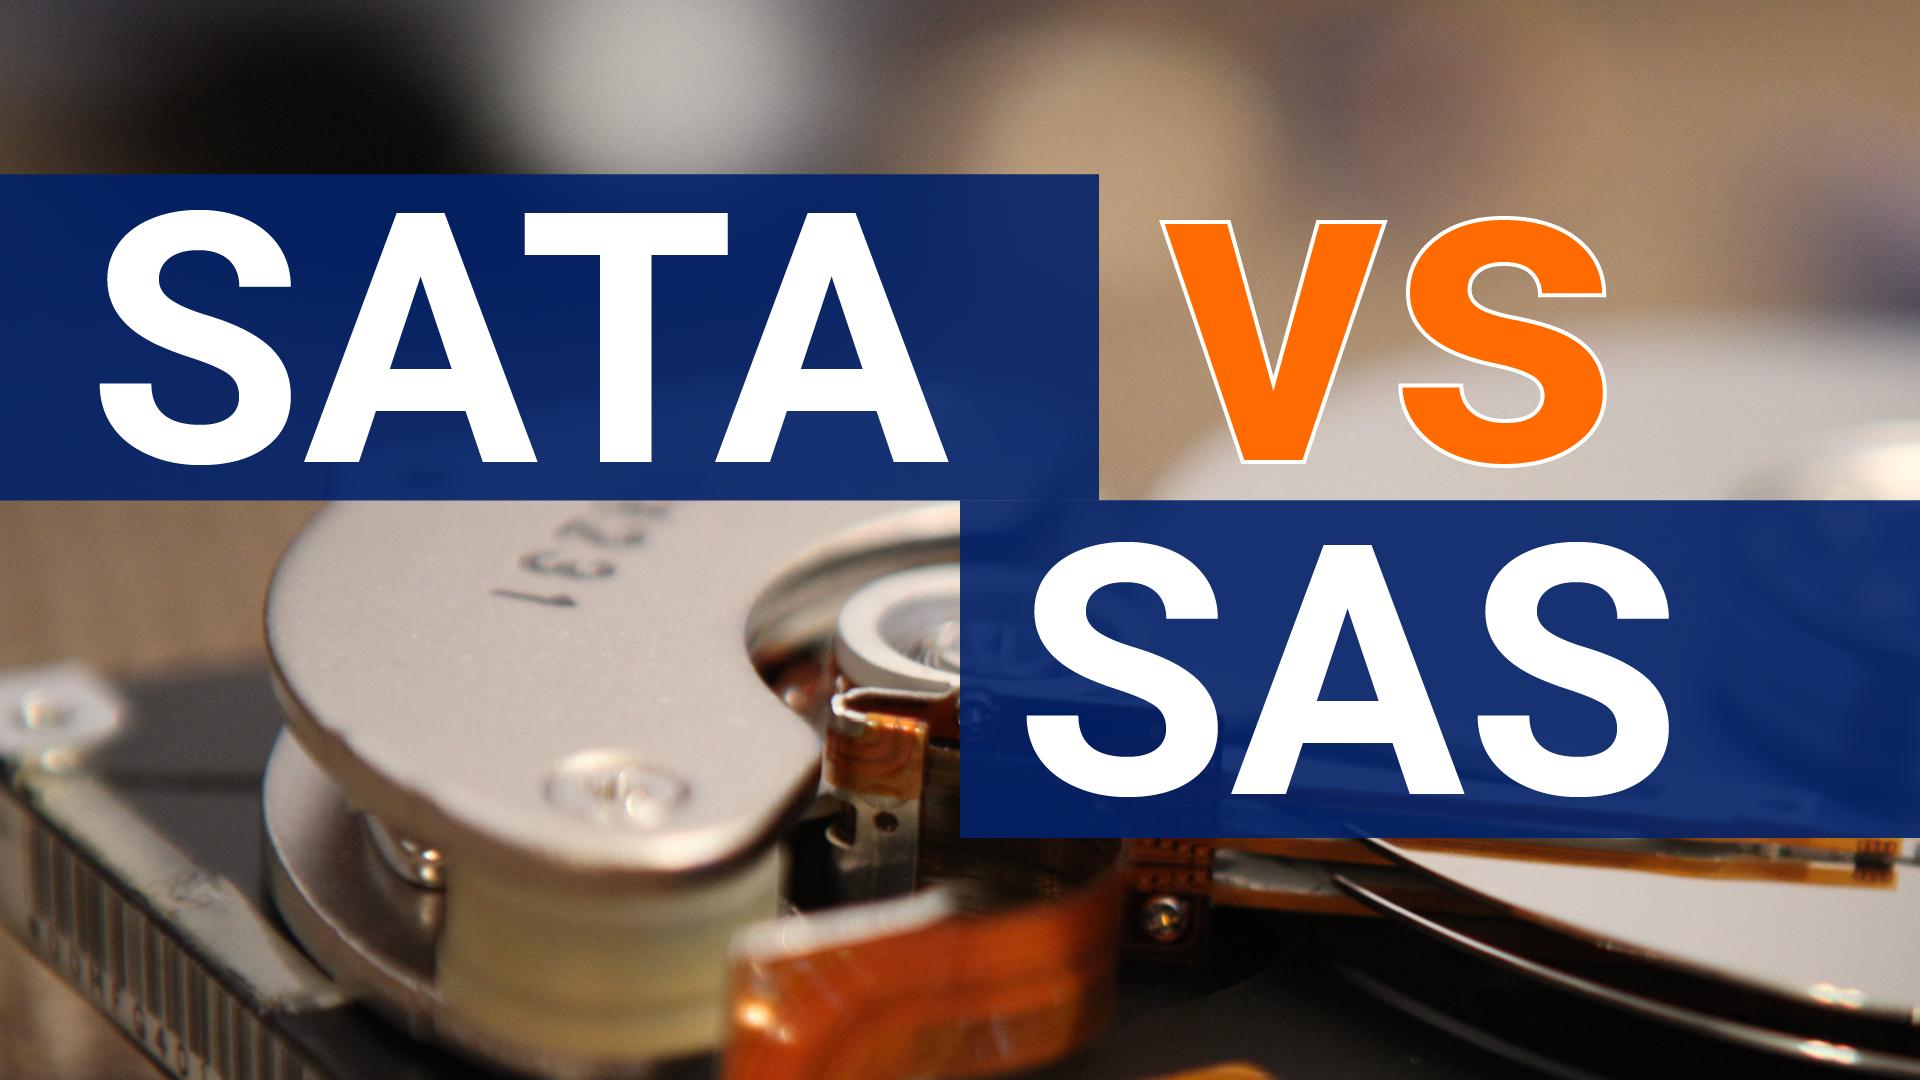 SATA vs SAS